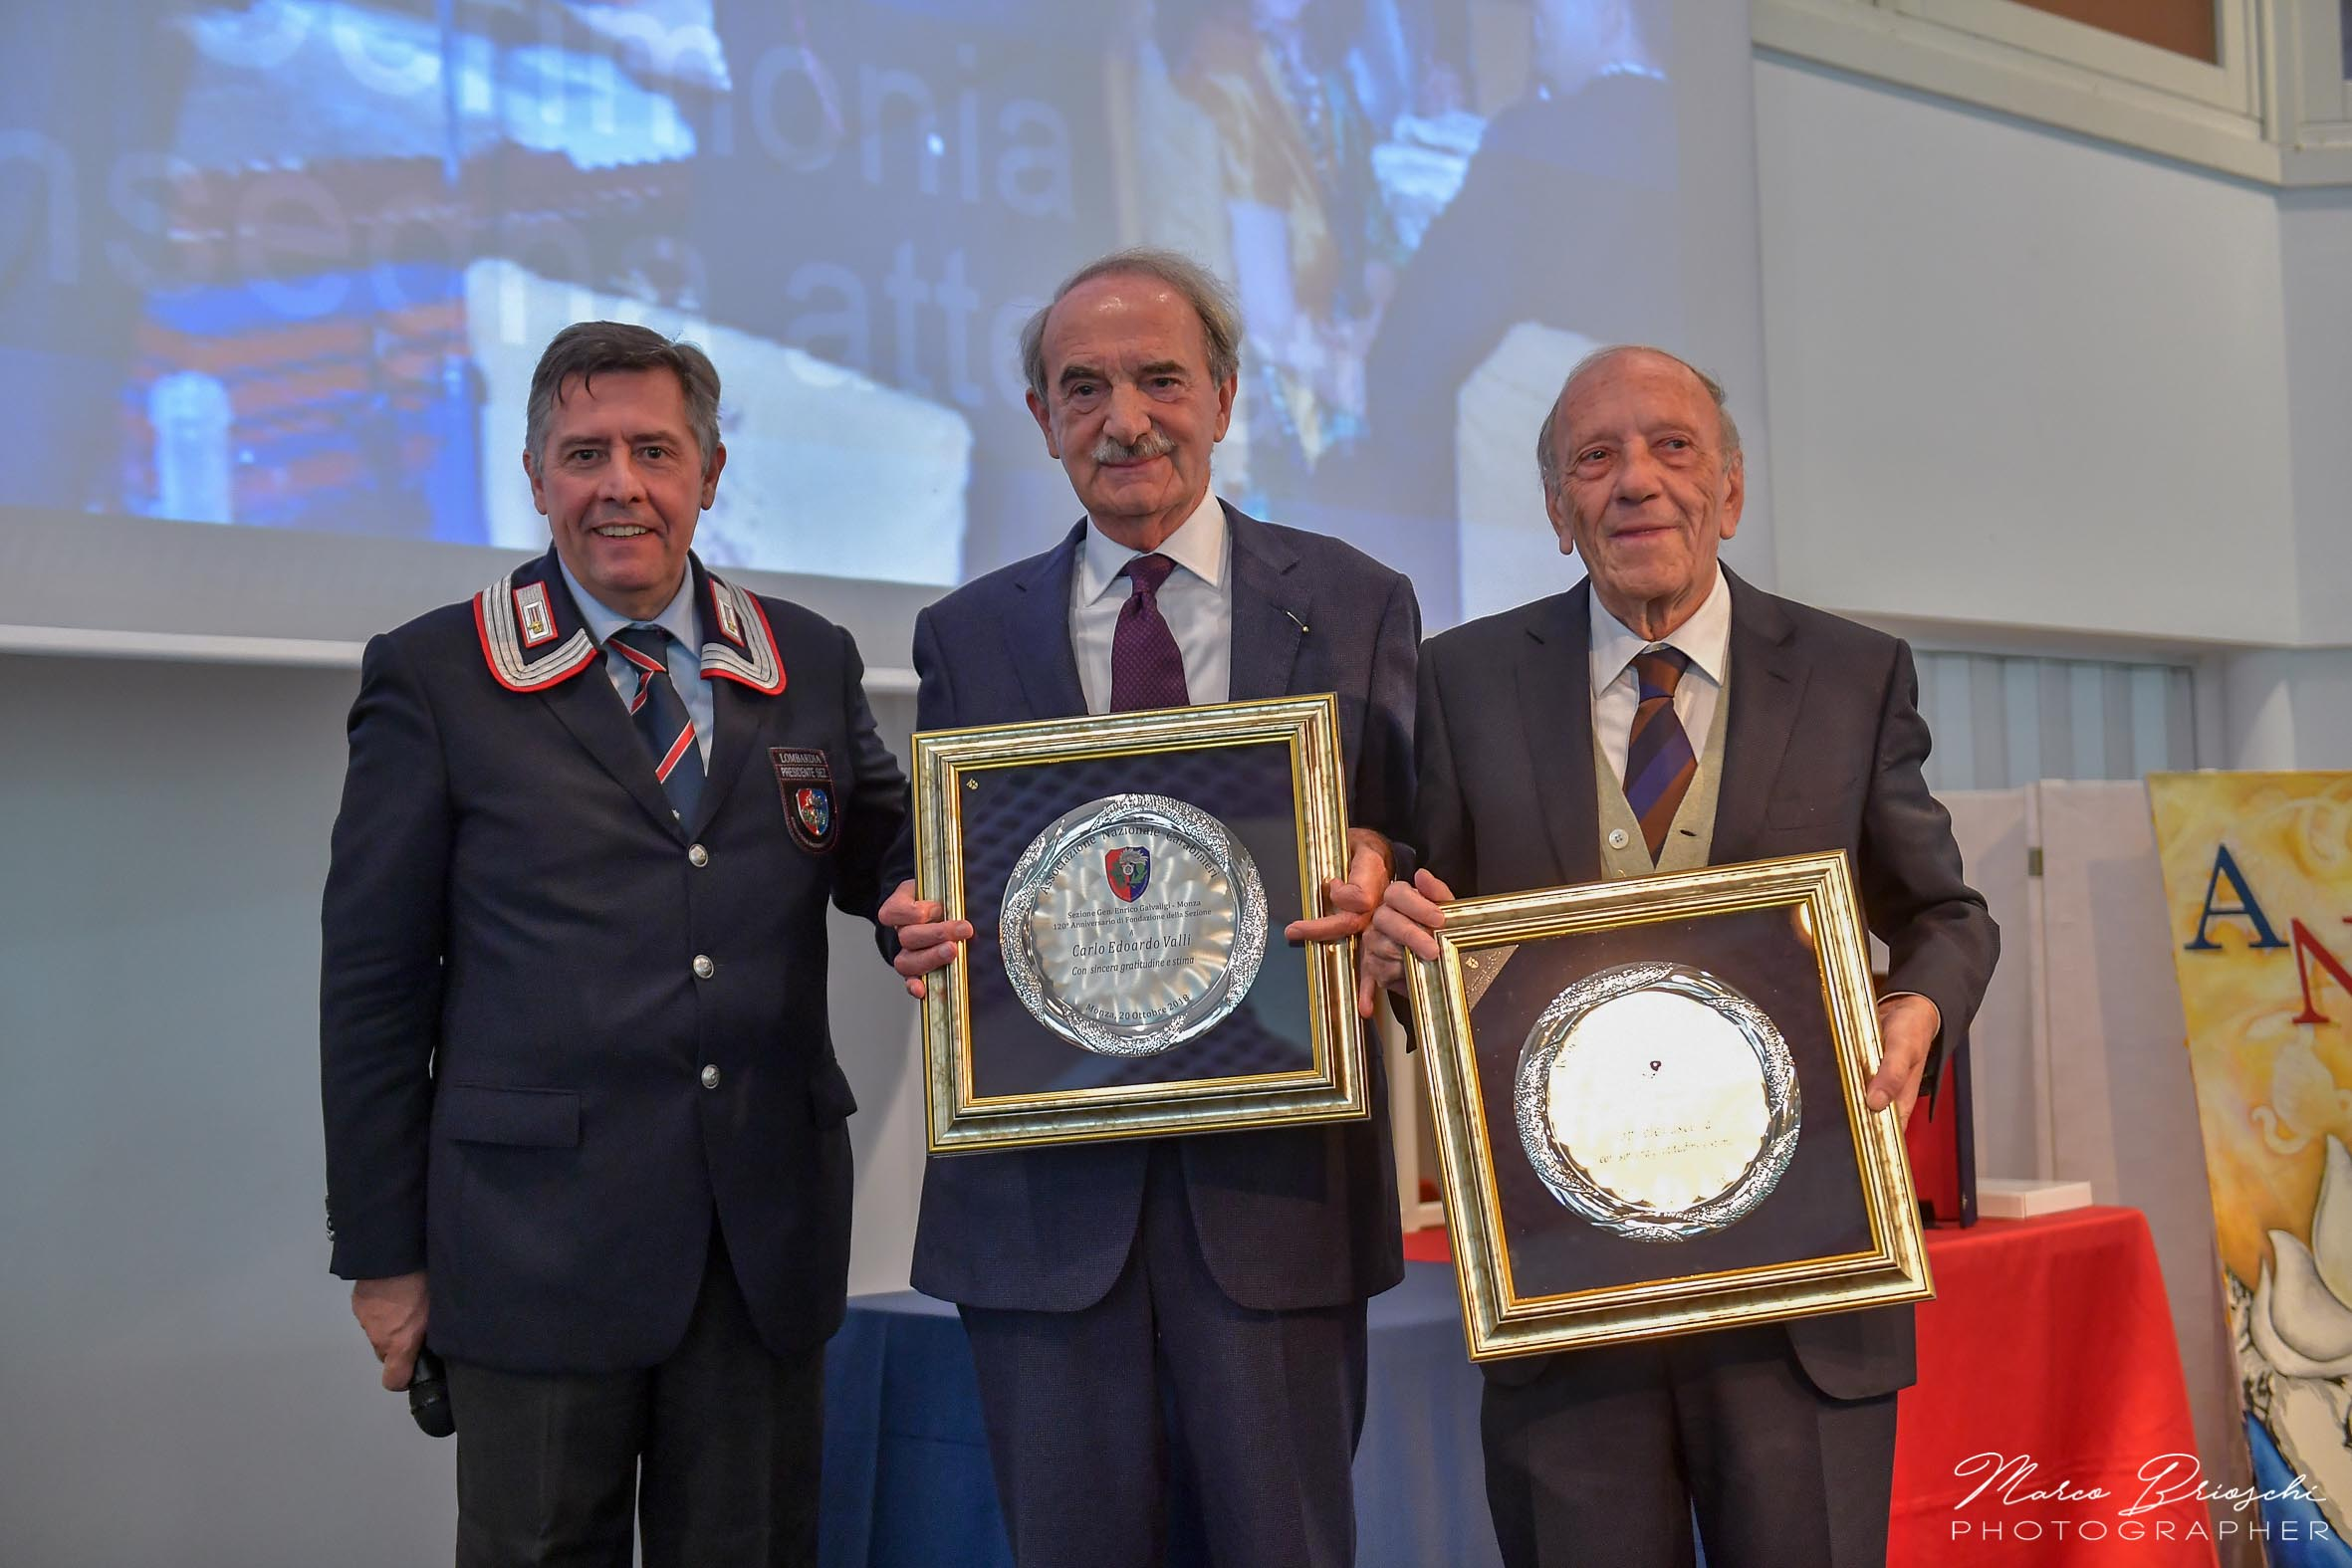 monza associazione carabinieri valli